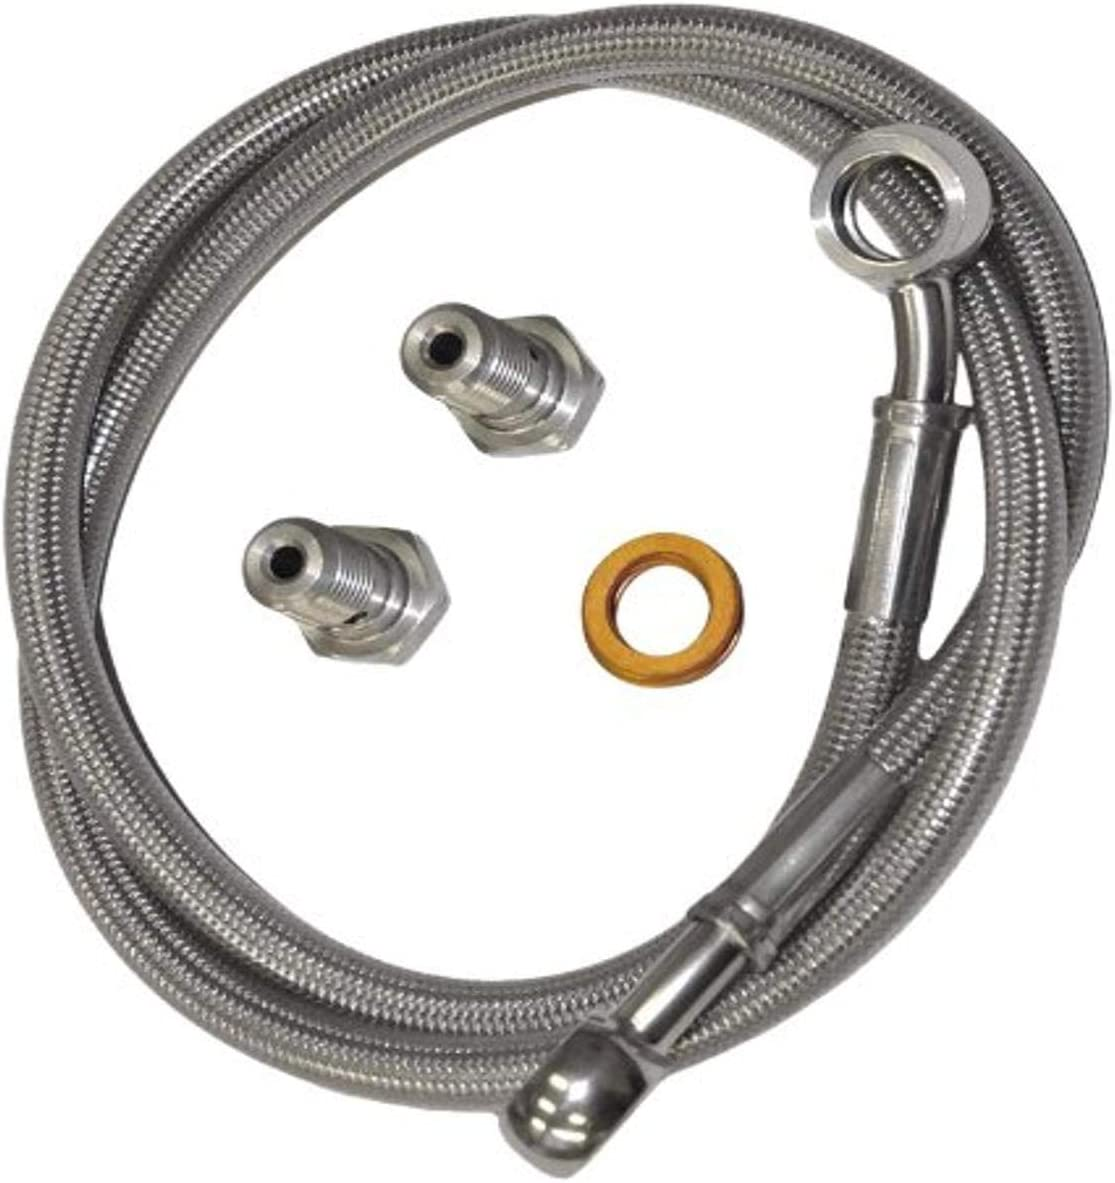 Yana Shiki OFFicial MSR9742+6 Stainless Line Rear Fees free!! Steel Brake